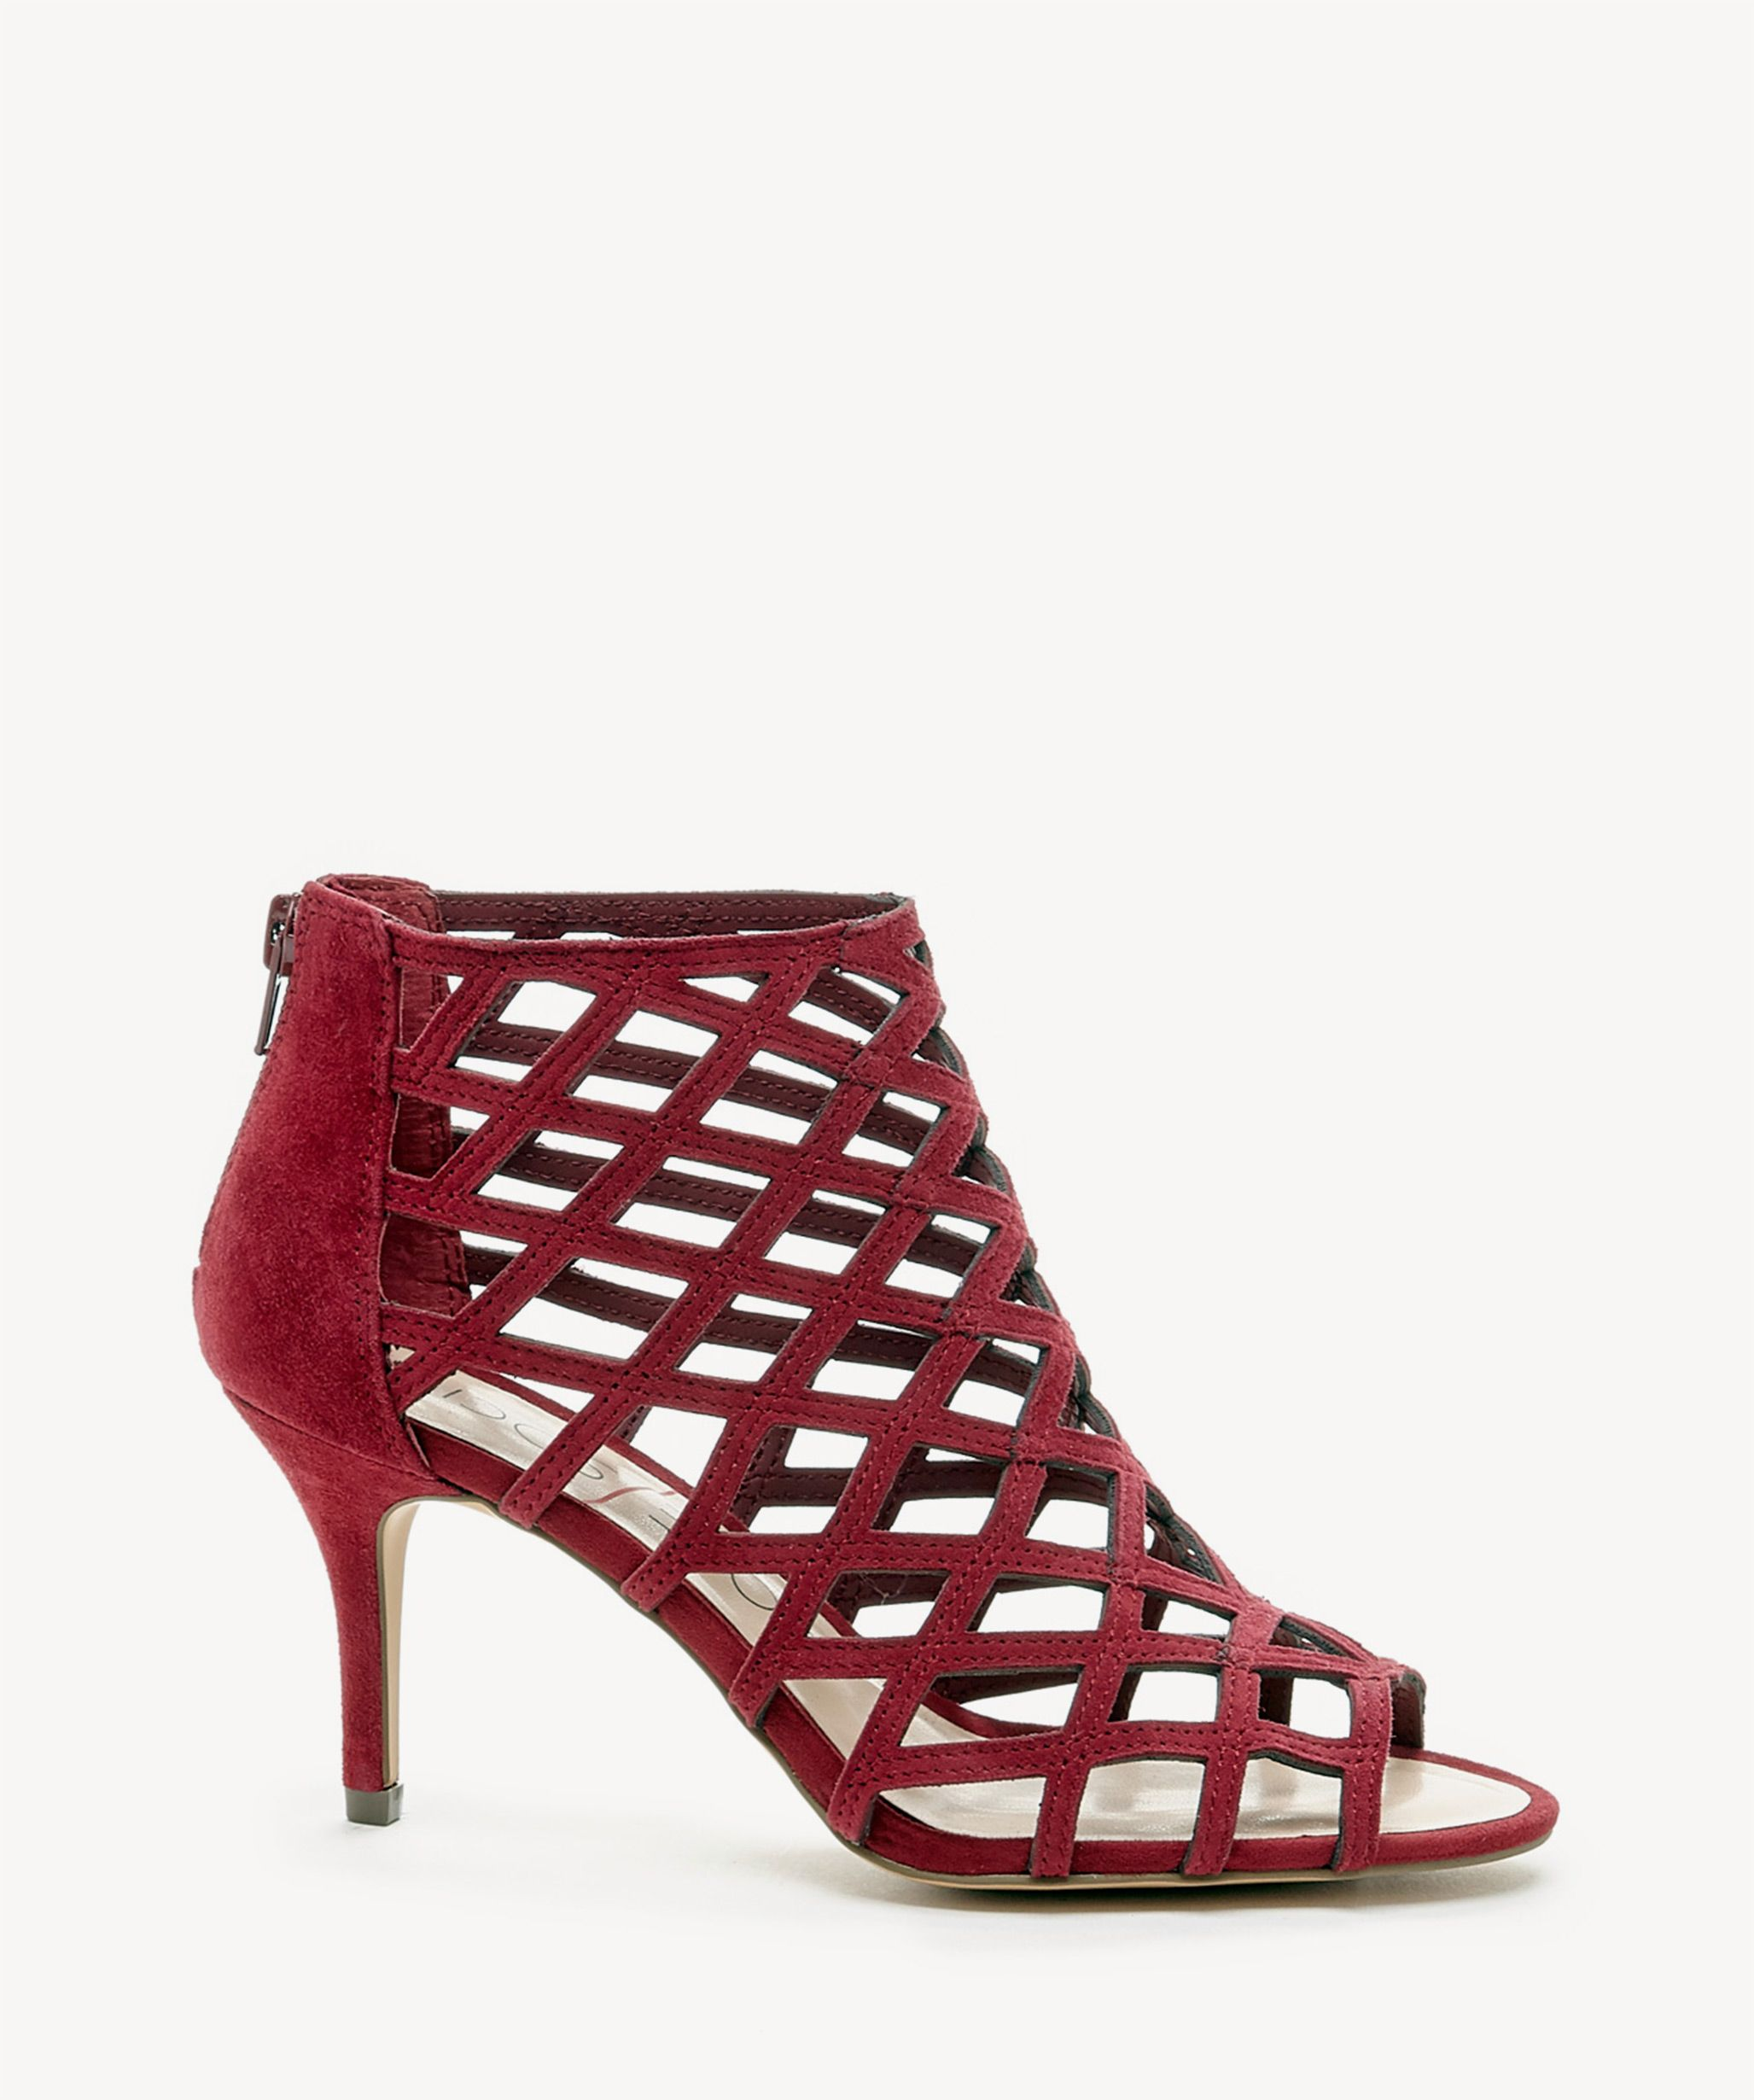 d6801edf426 Sole Society Portia Caged Mid Heels Crimson | Size 11 Suede ...